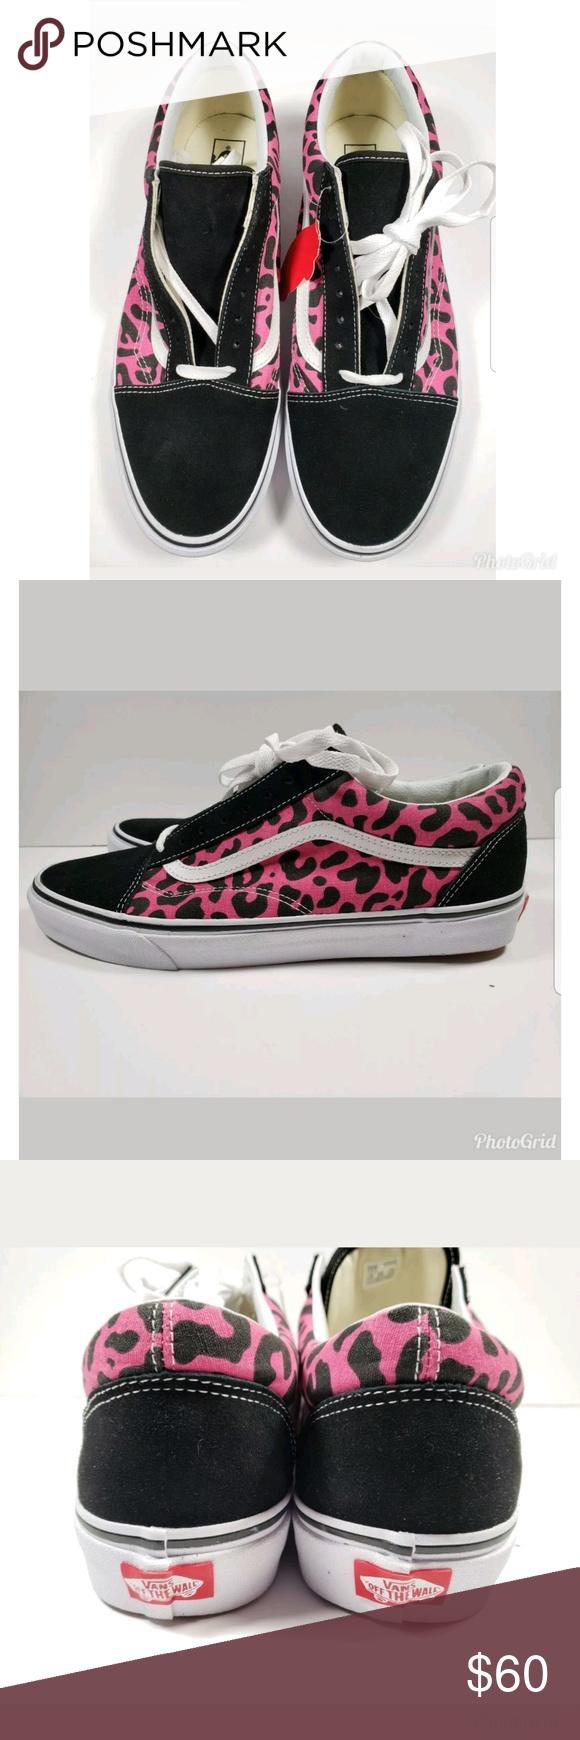 c1f52355e78 New Vans Old Skool Leopard Print Pink Black sz 13 New with tags Vans Old  Skool